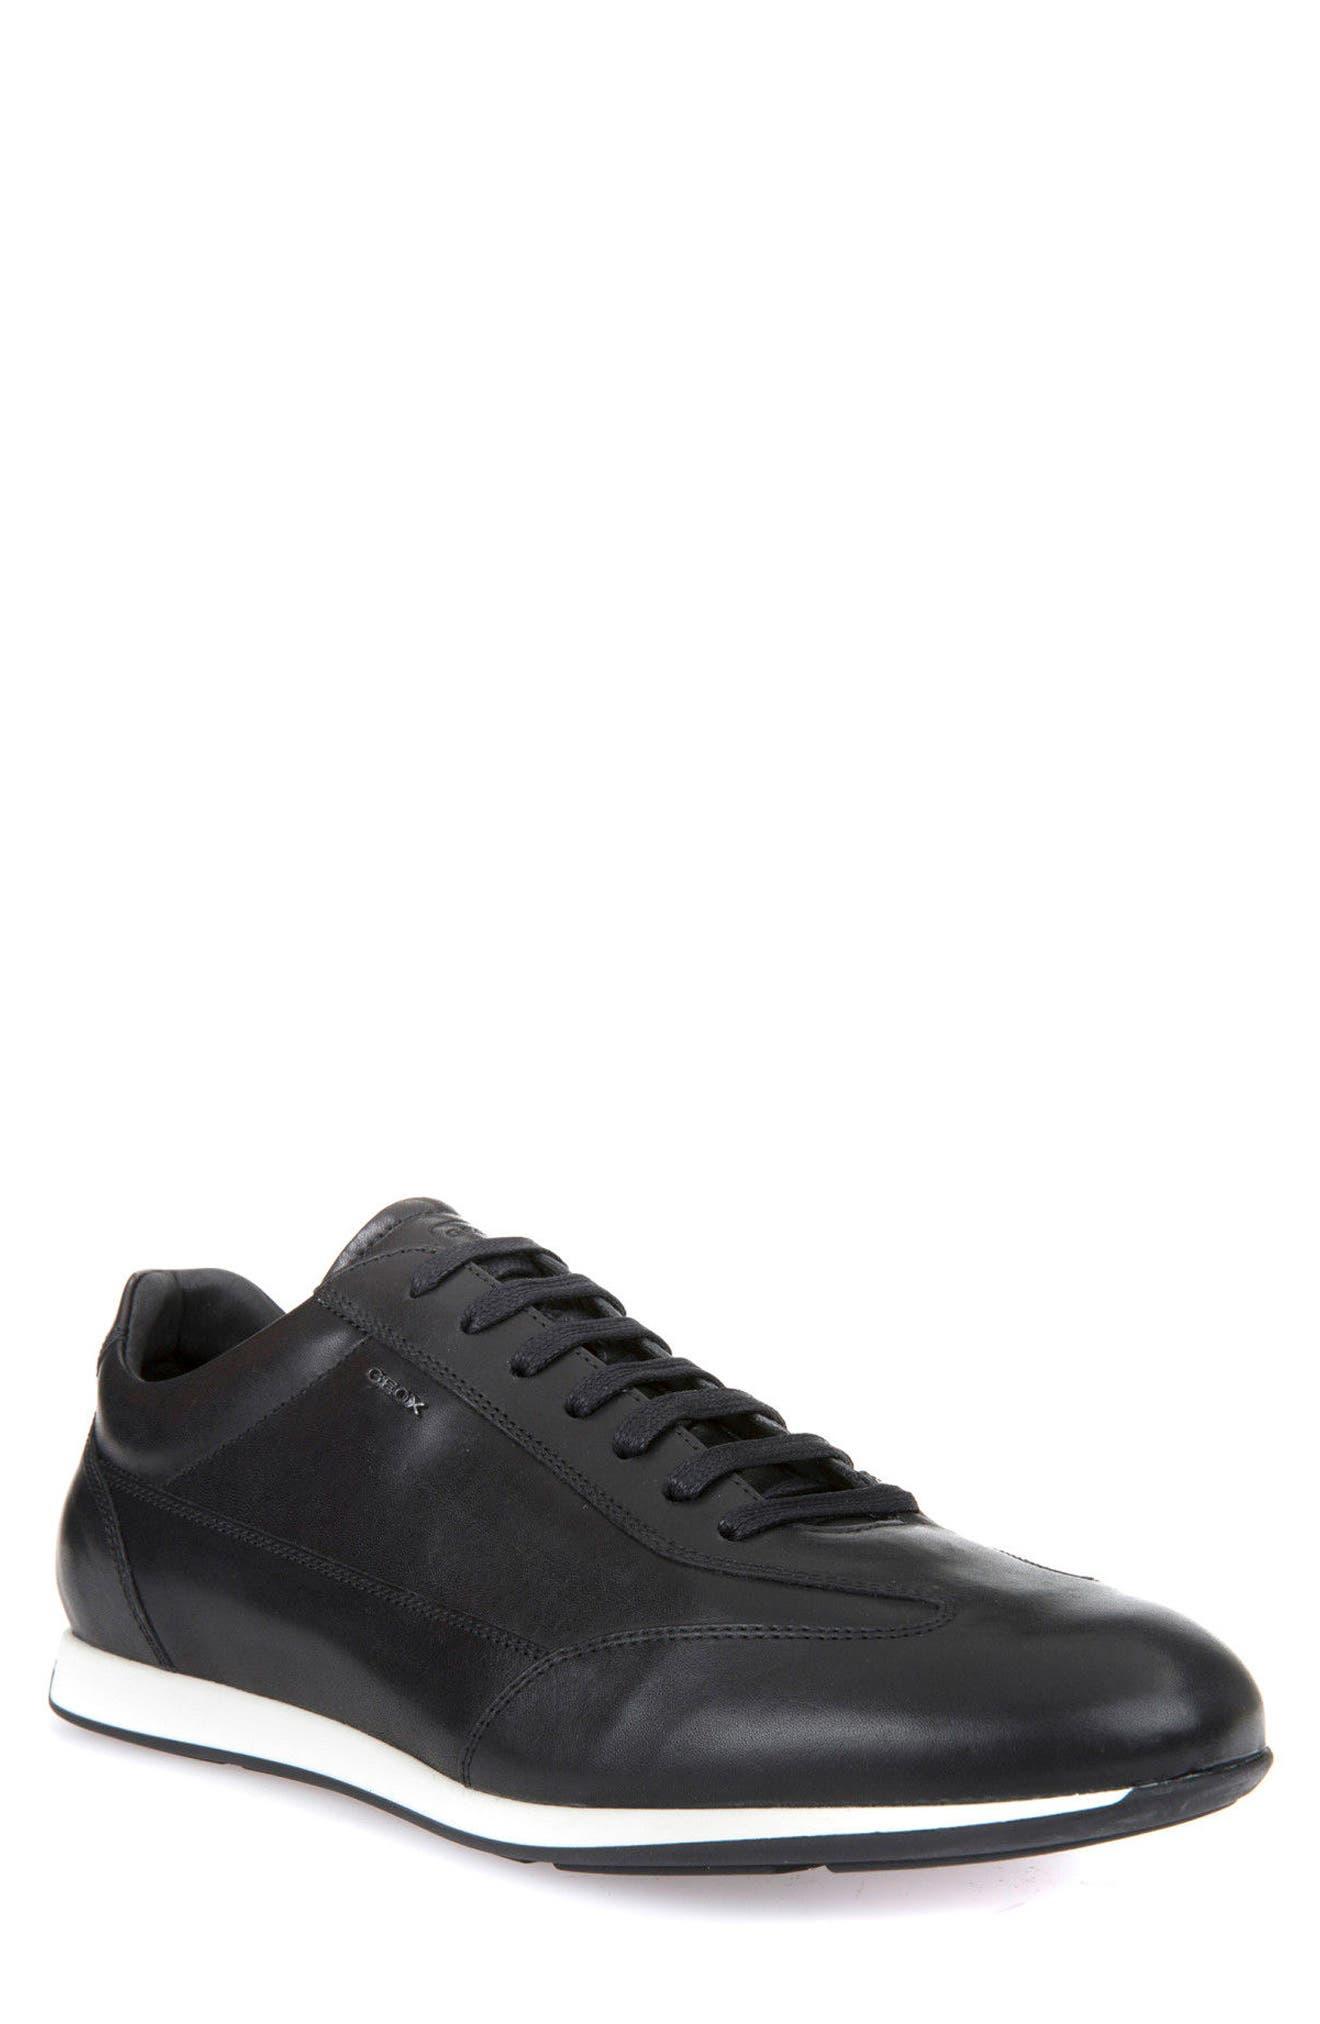 Clemet 1 Sneaker,                         Main,                         color,